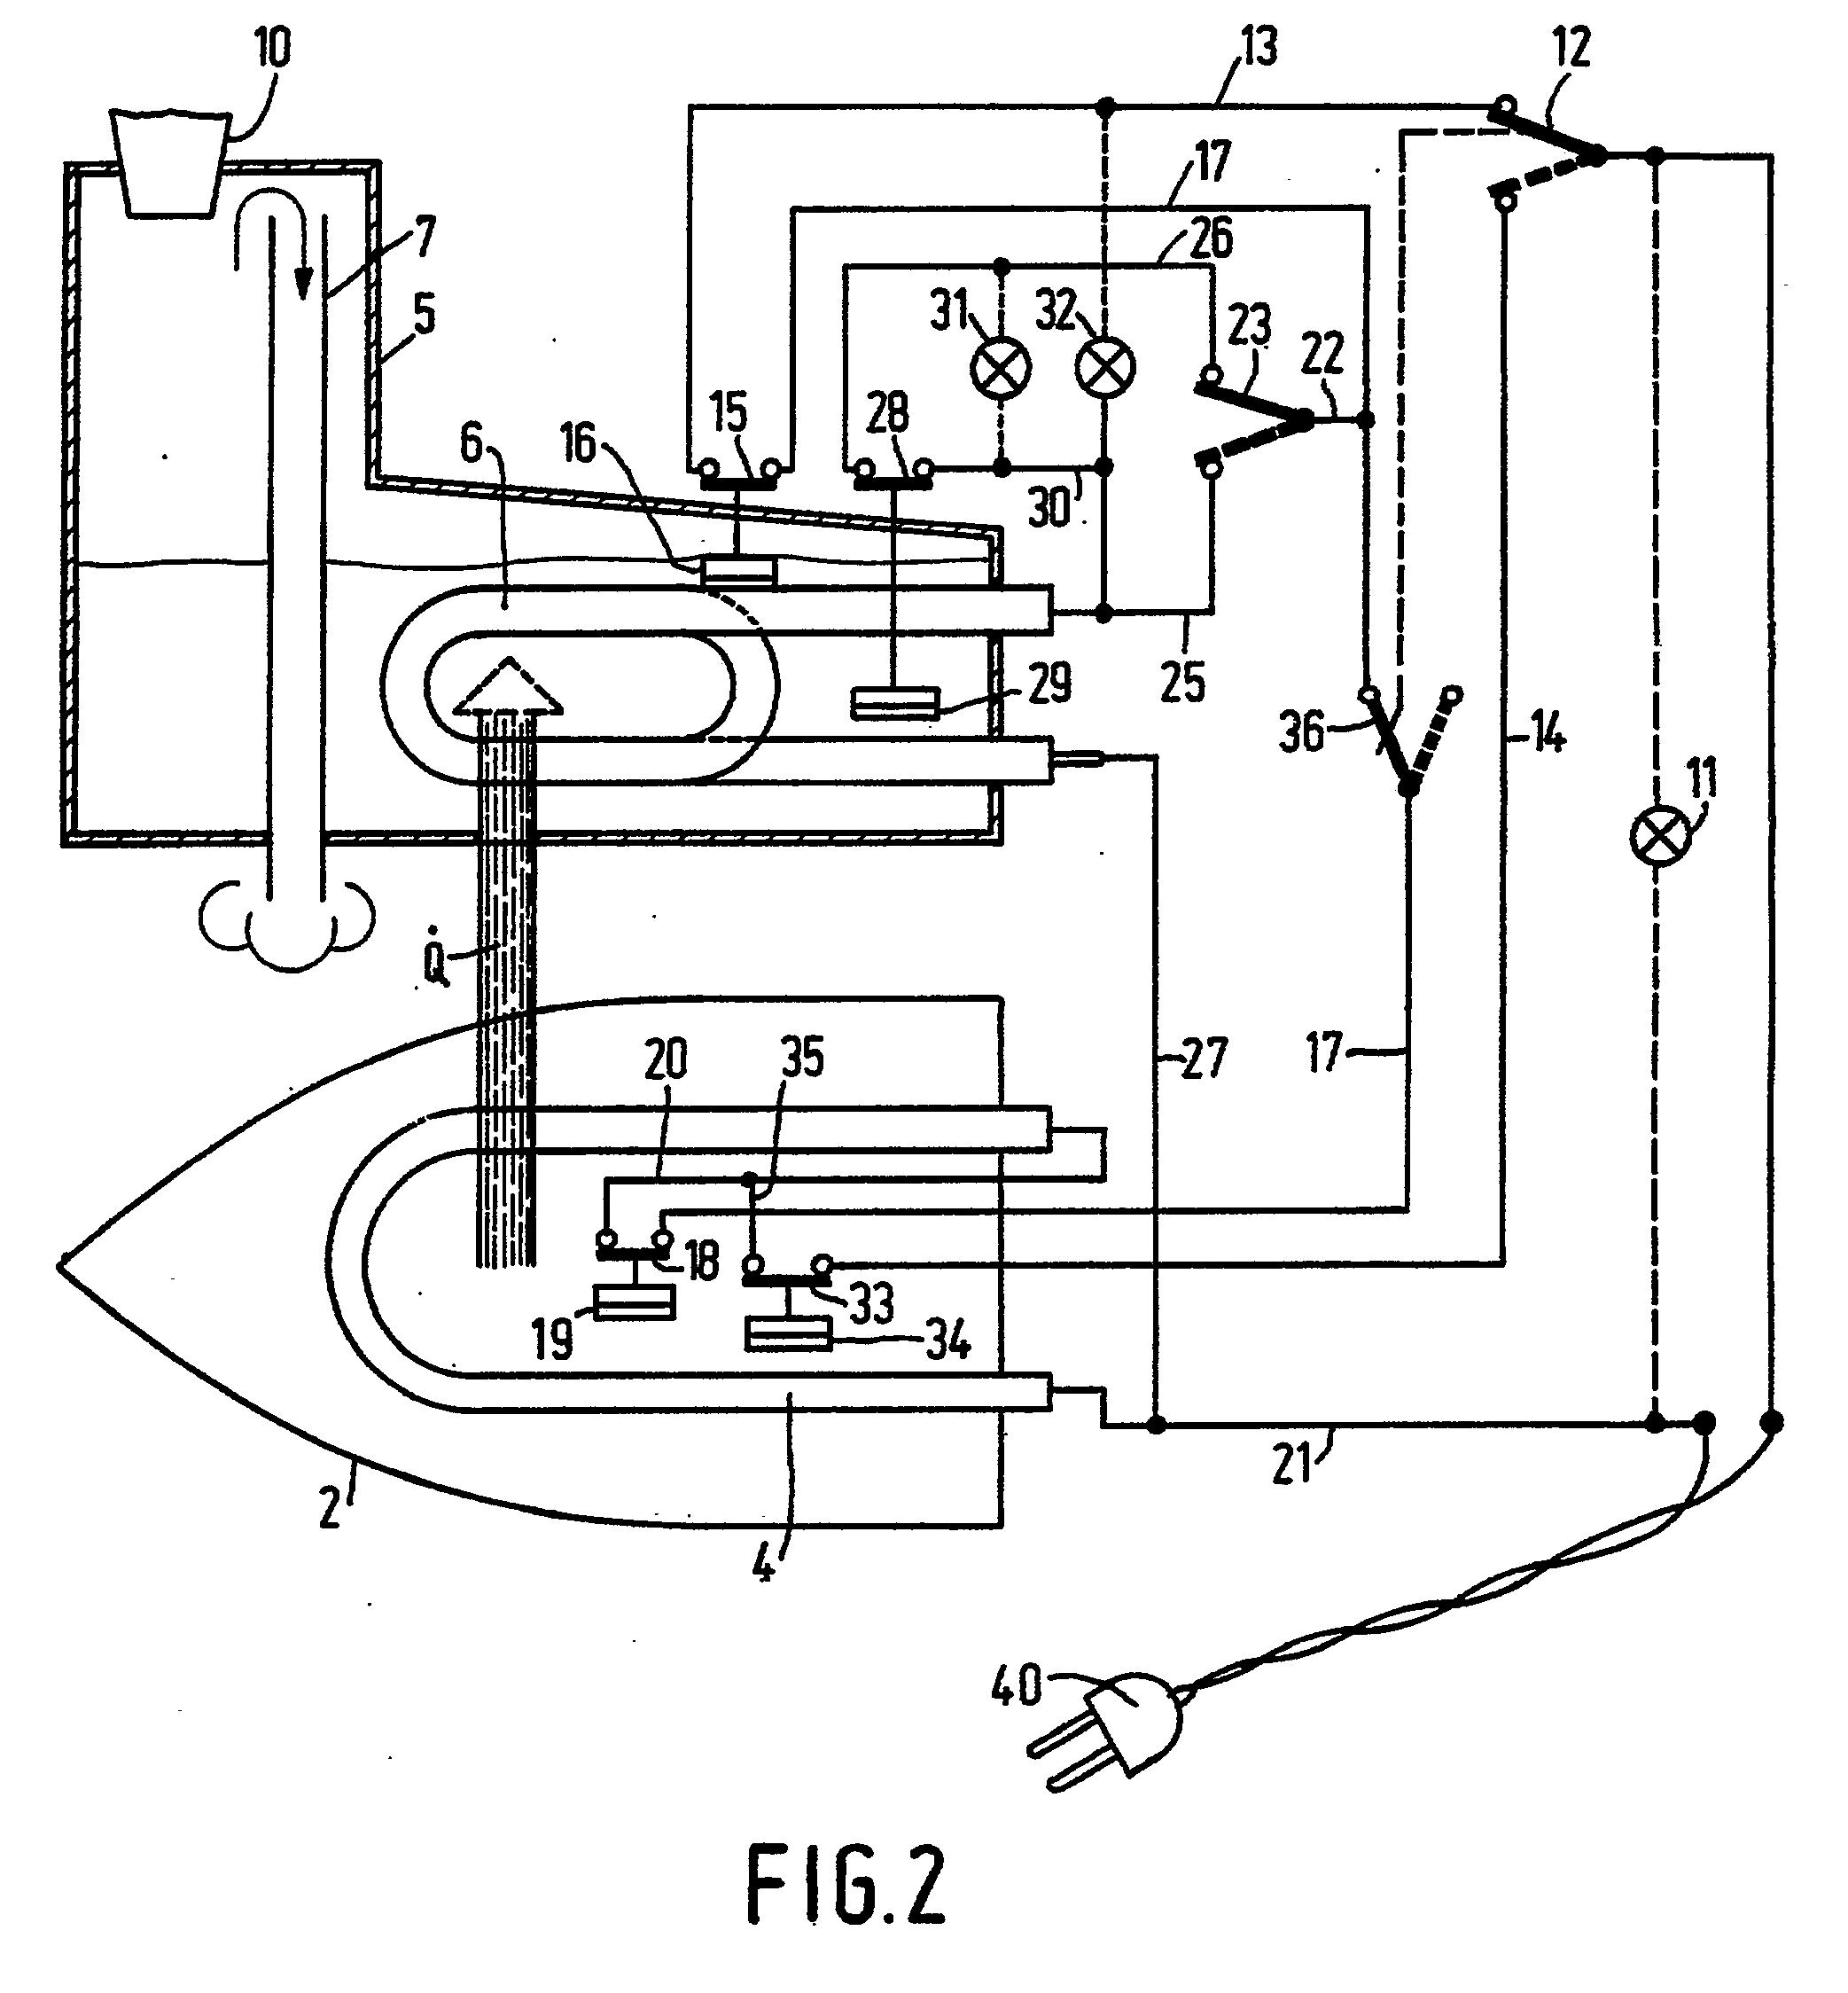 Patent Ep0232924b1 - Steam Iron